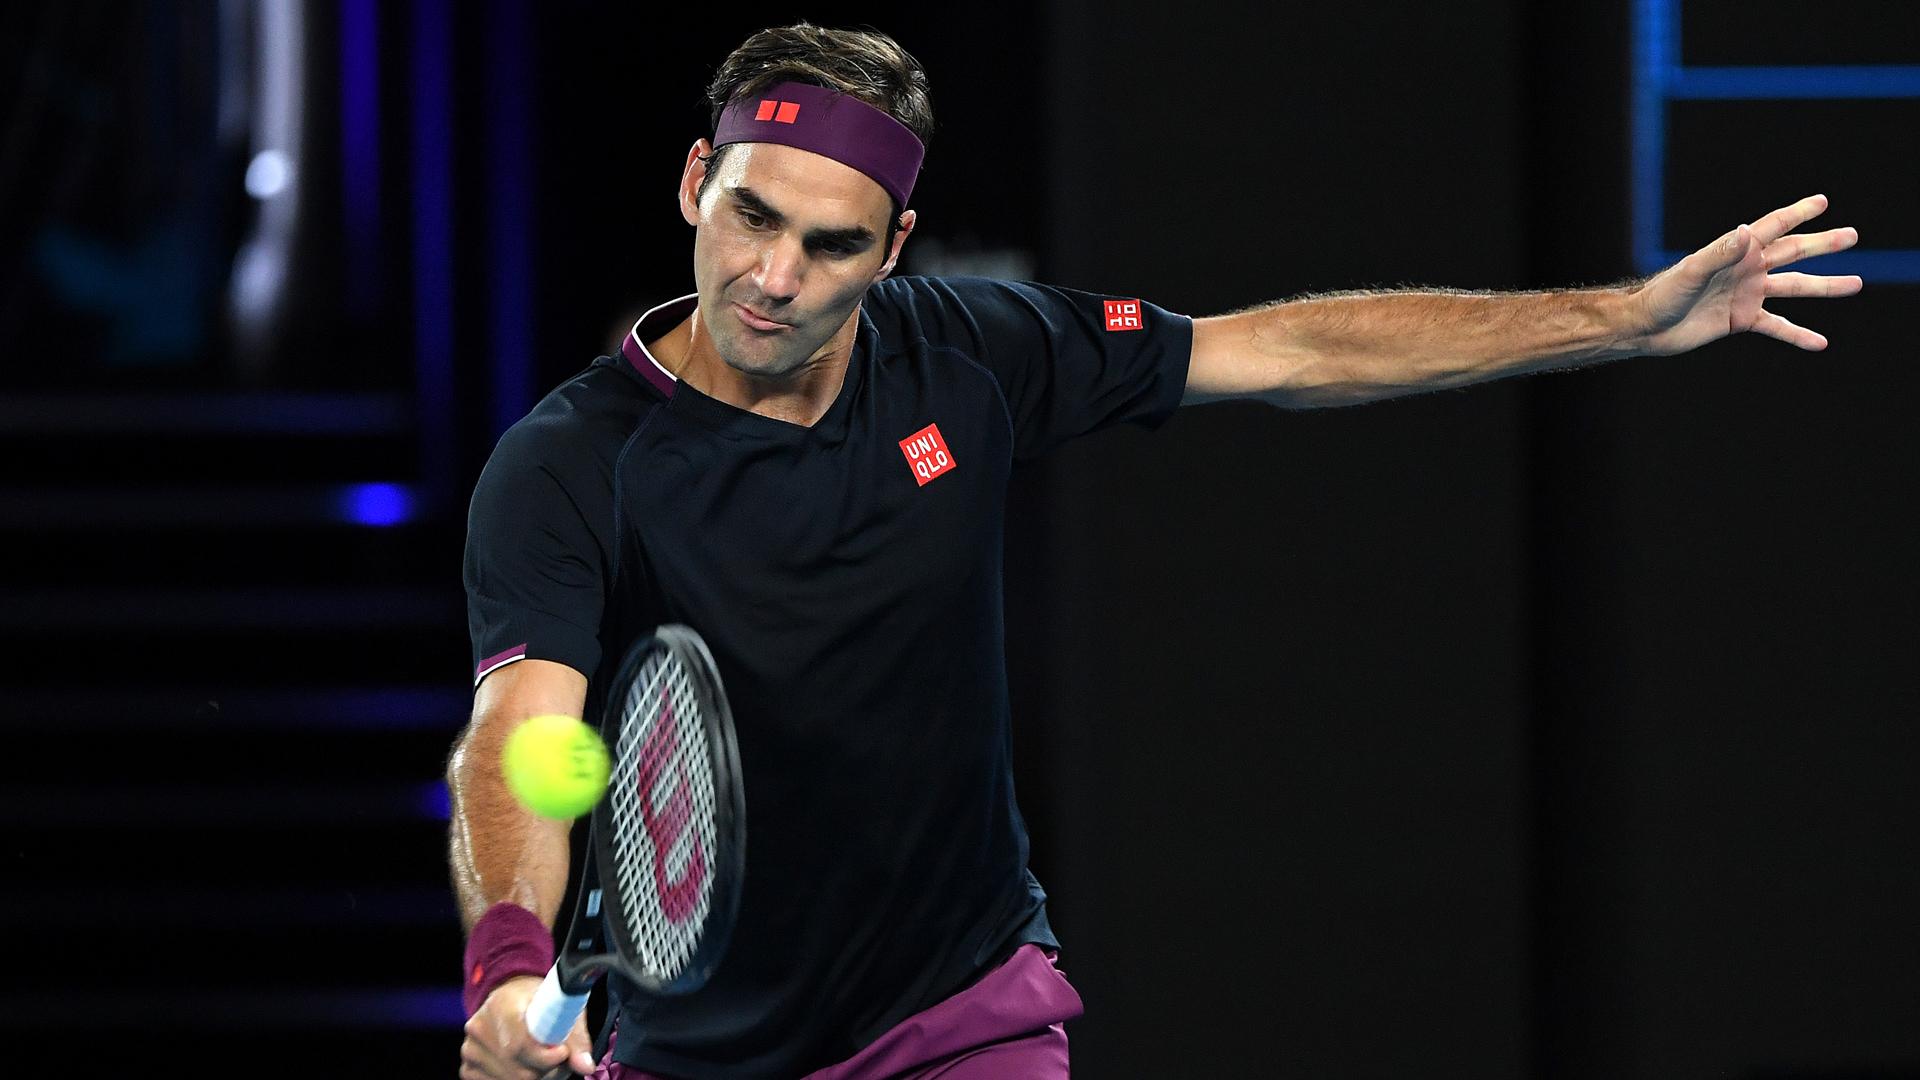 Coronavirus: Federer challenges fans, celebrities in volleying drill